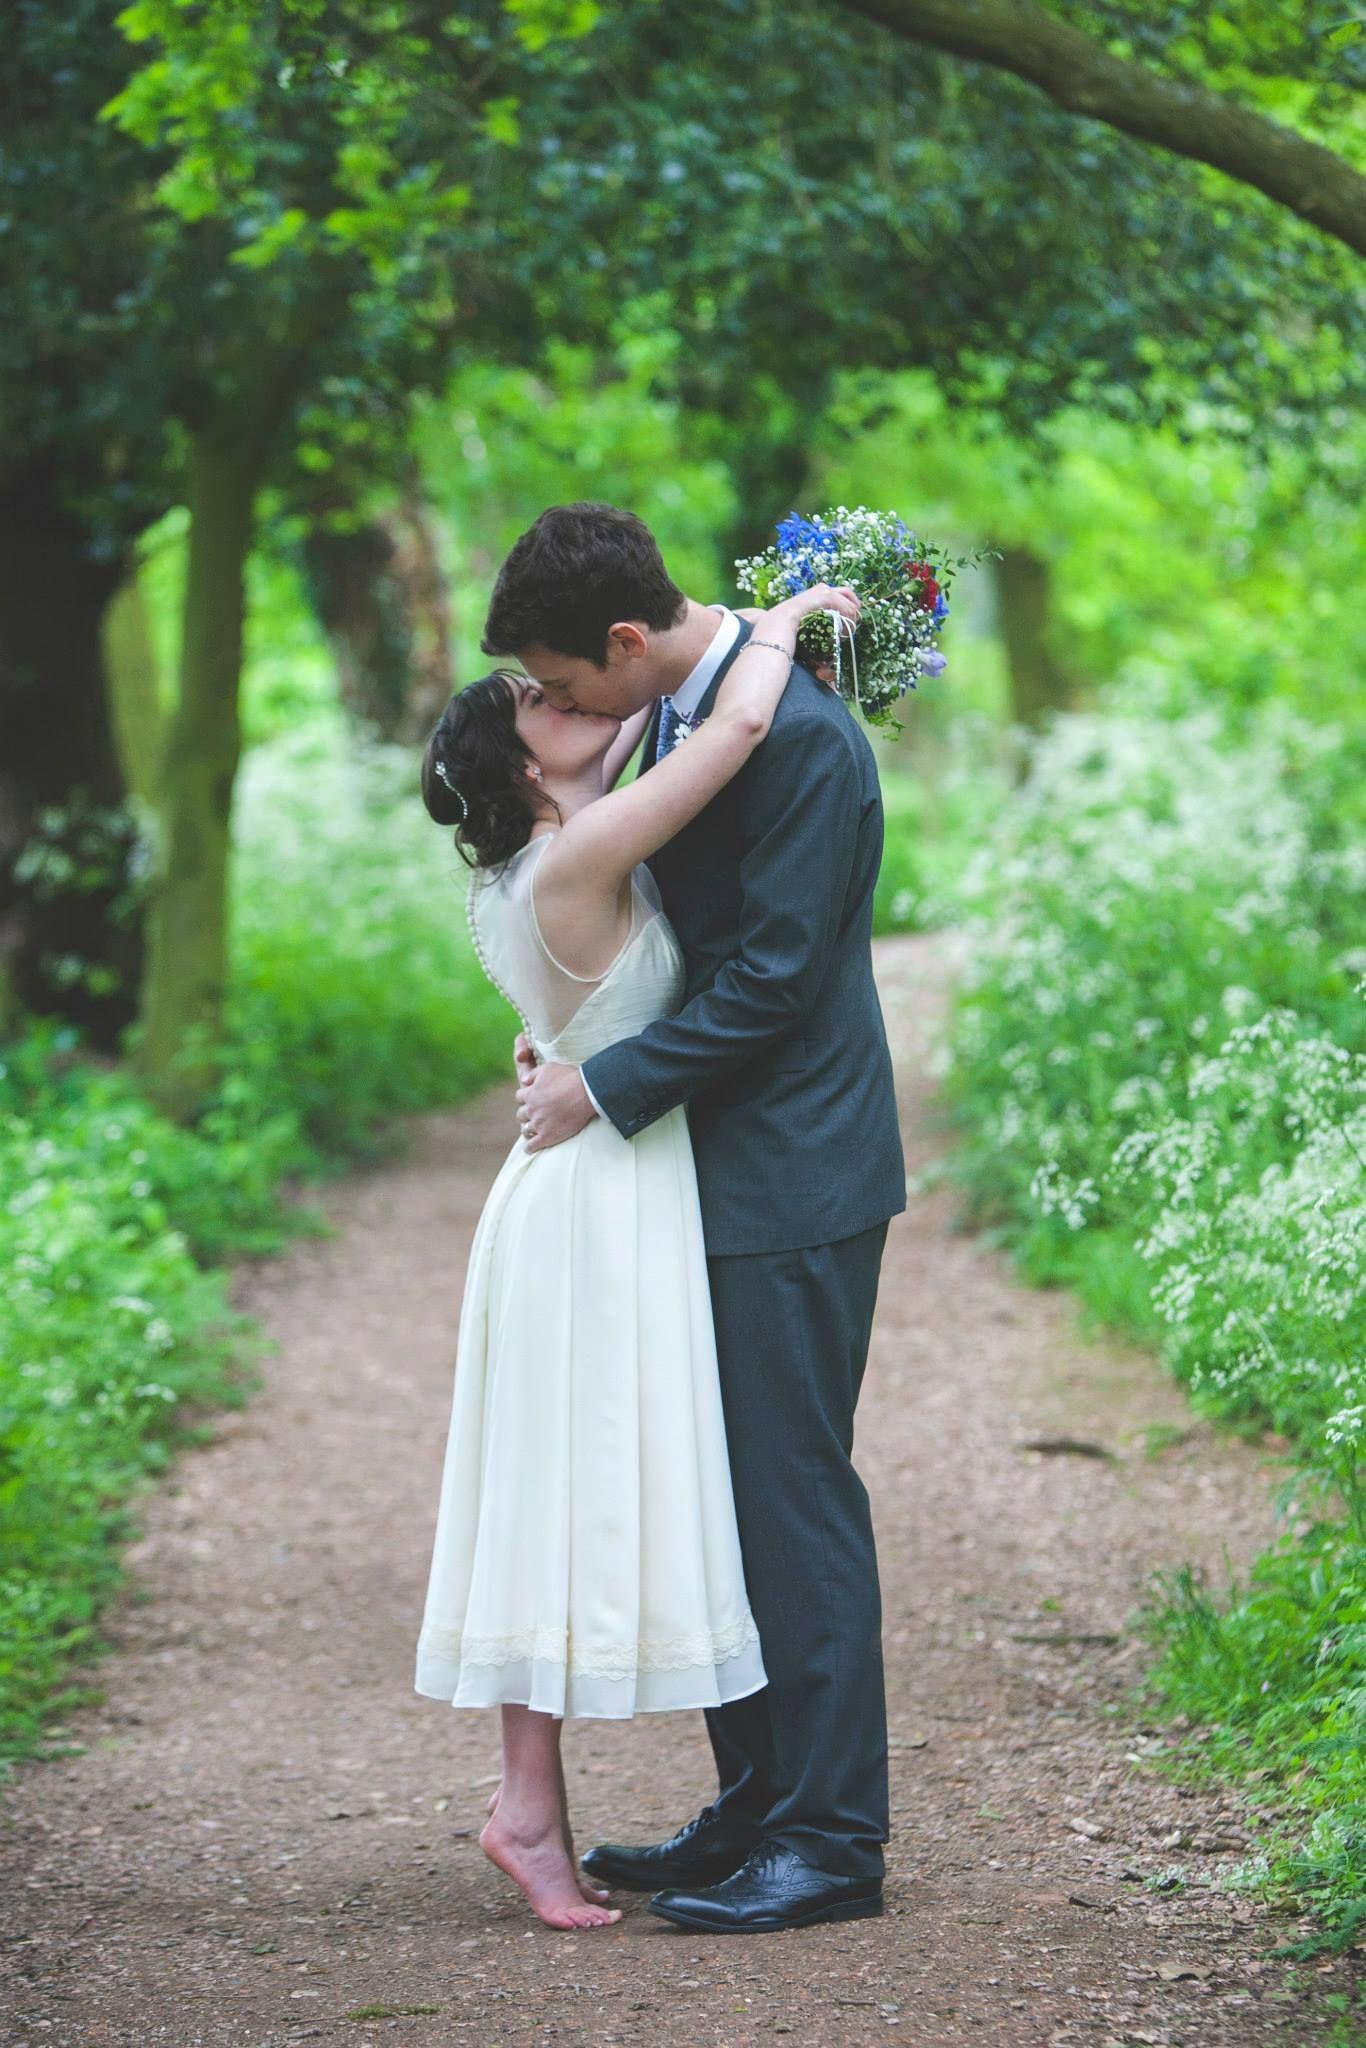 Wedding Photography Short Bride Tall Groom Wood Forest Photo Shoot Gypsophila Baby S B Short Bride Fun Wedding Photography Backyard Wedding Photography [ 2048 x 1366 Pixel ]